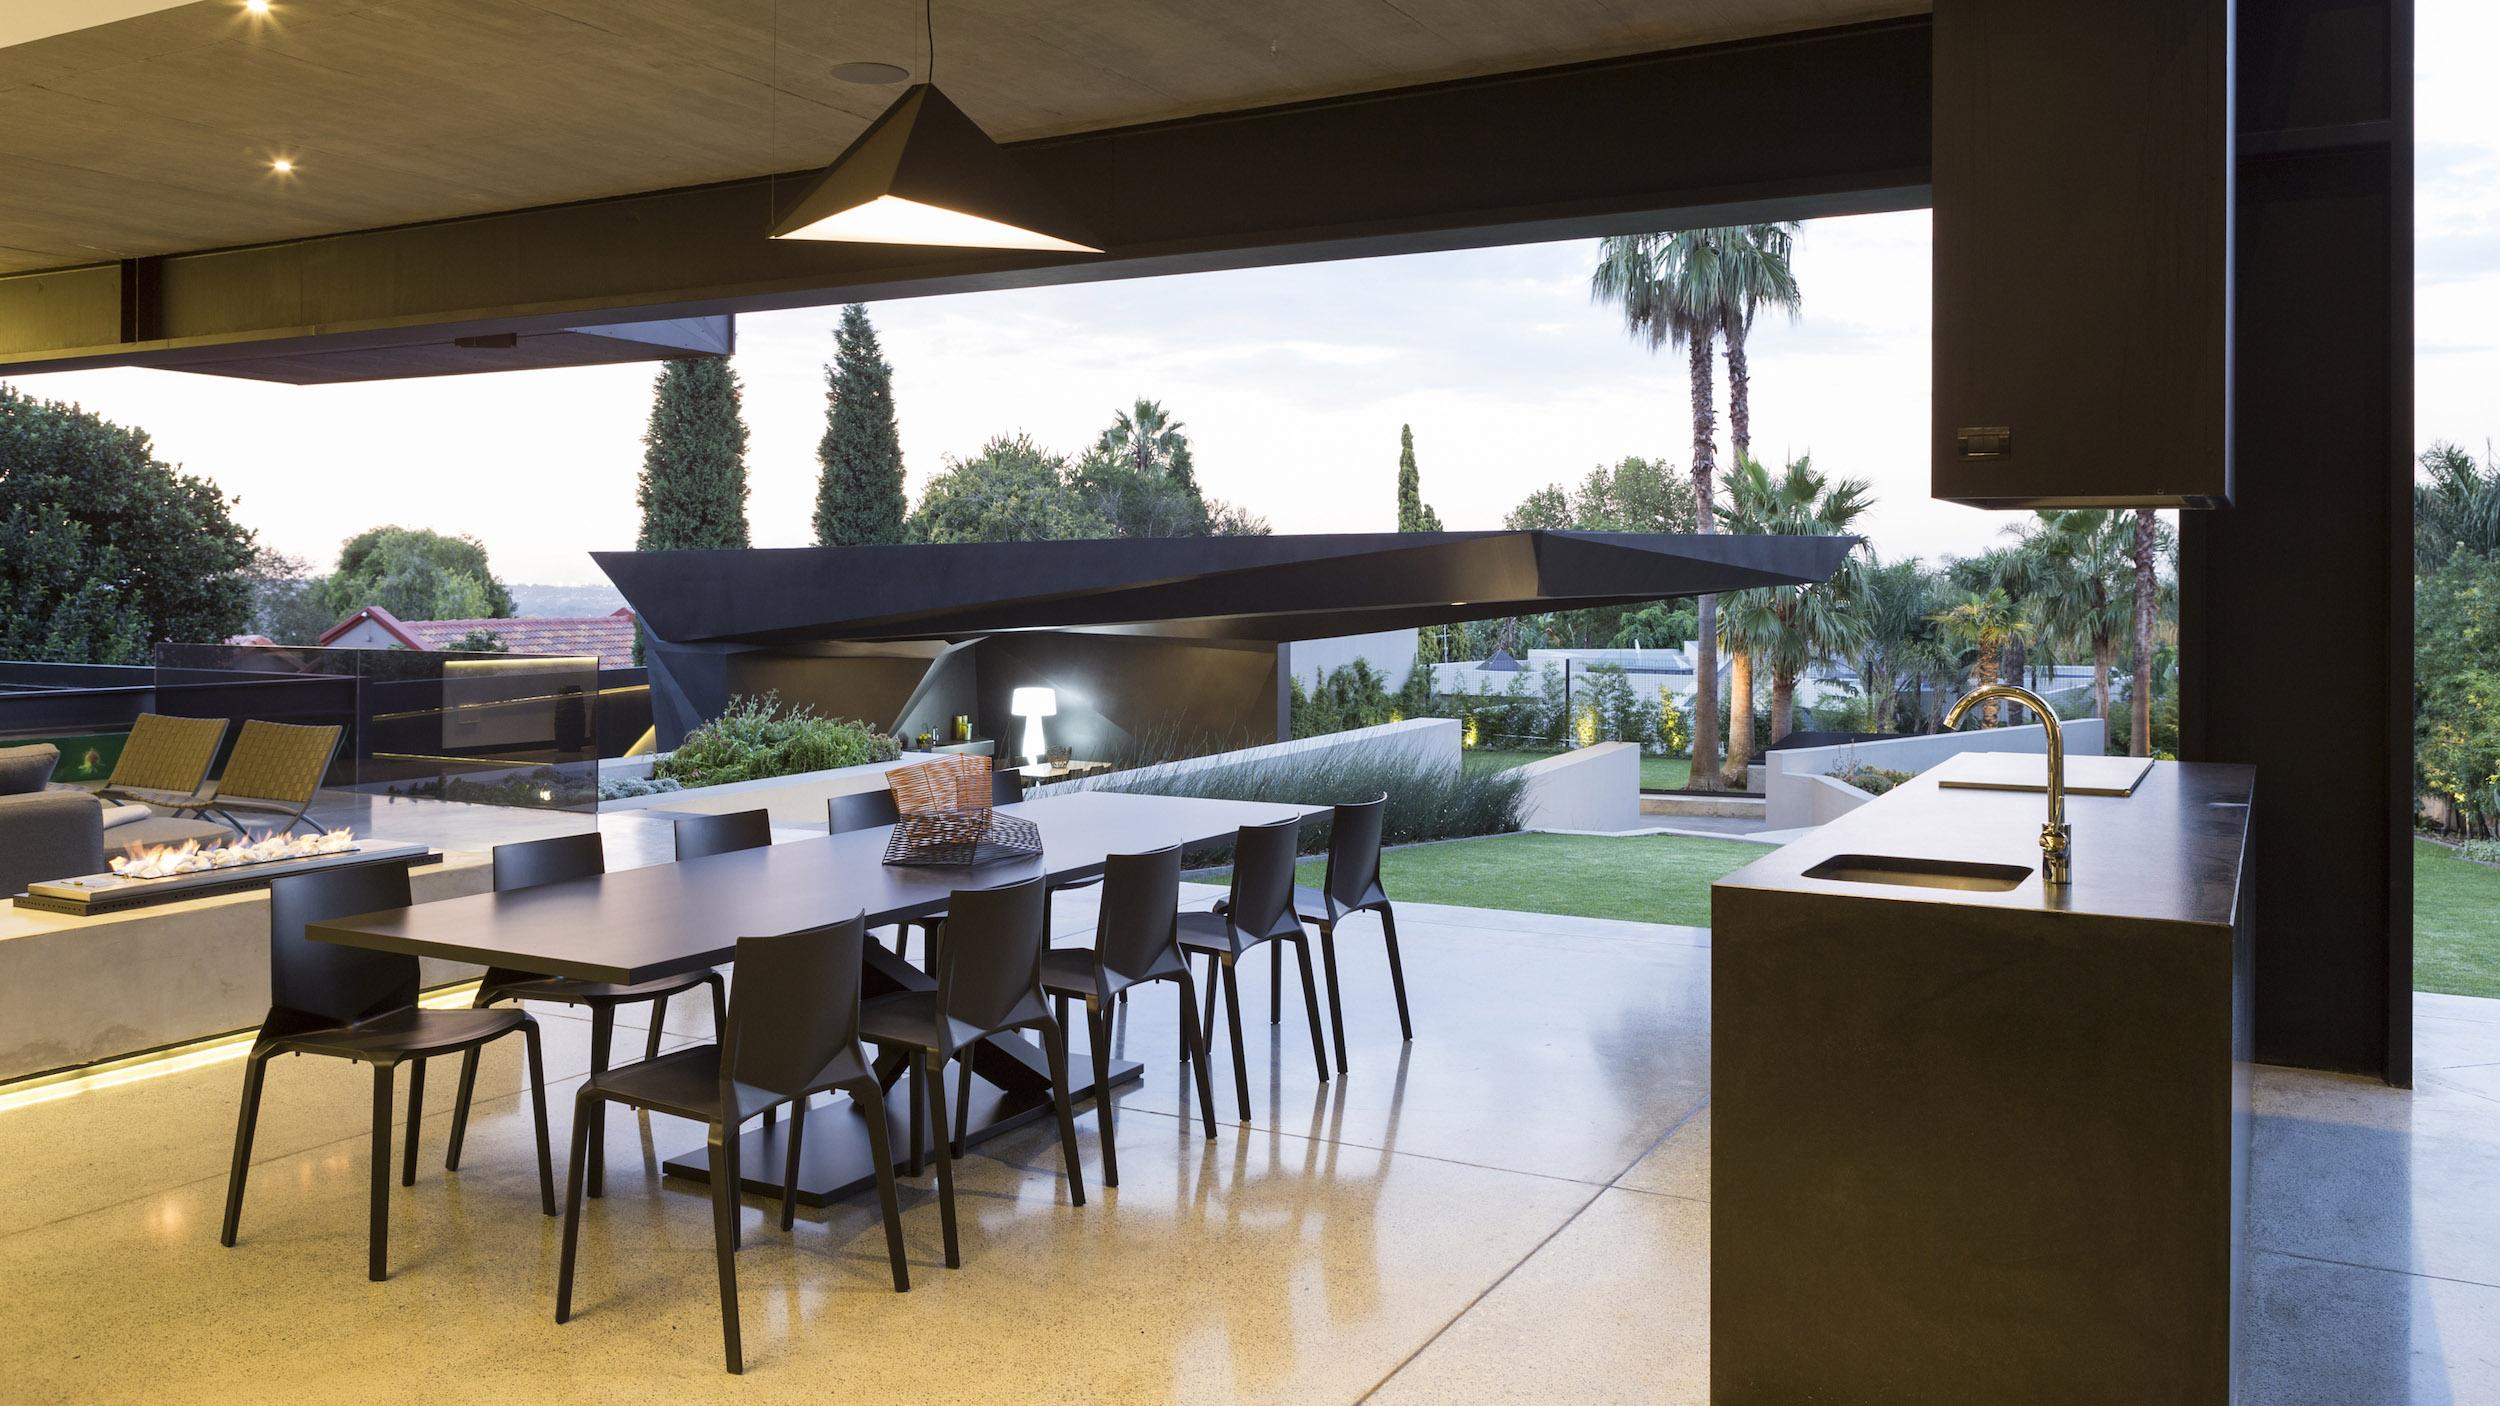 Kloof Road Masterpiece House in Johannesburg by Nico van der Meulen Architects-22